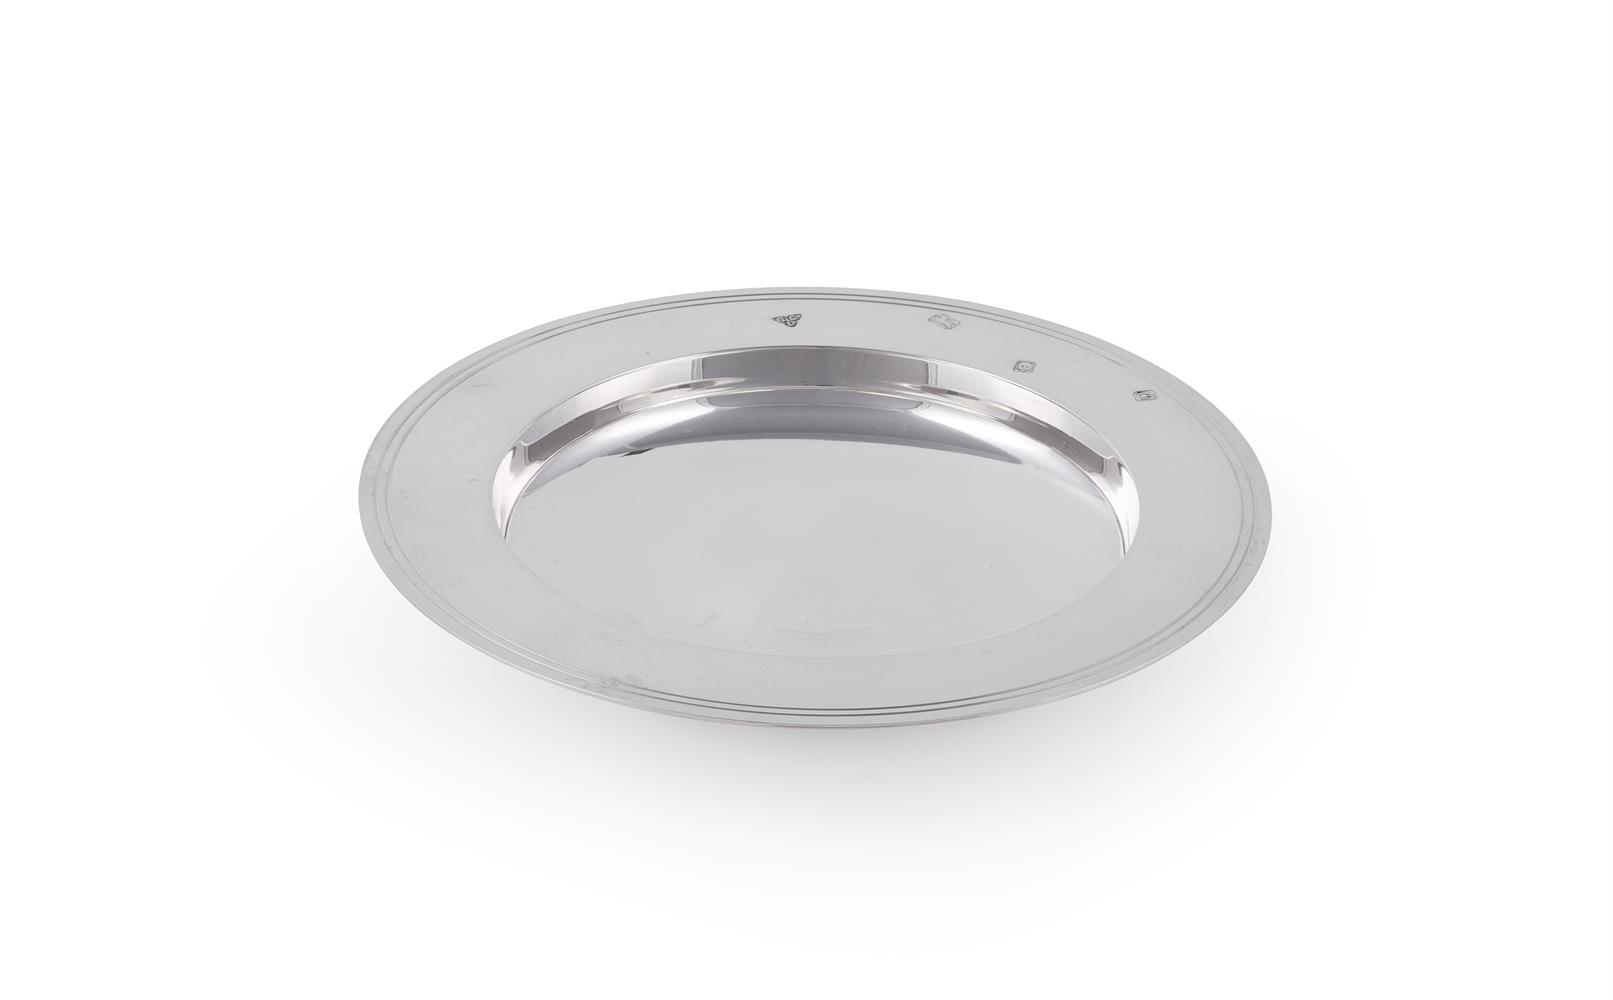 A silver armada dish by Garrard & Co.